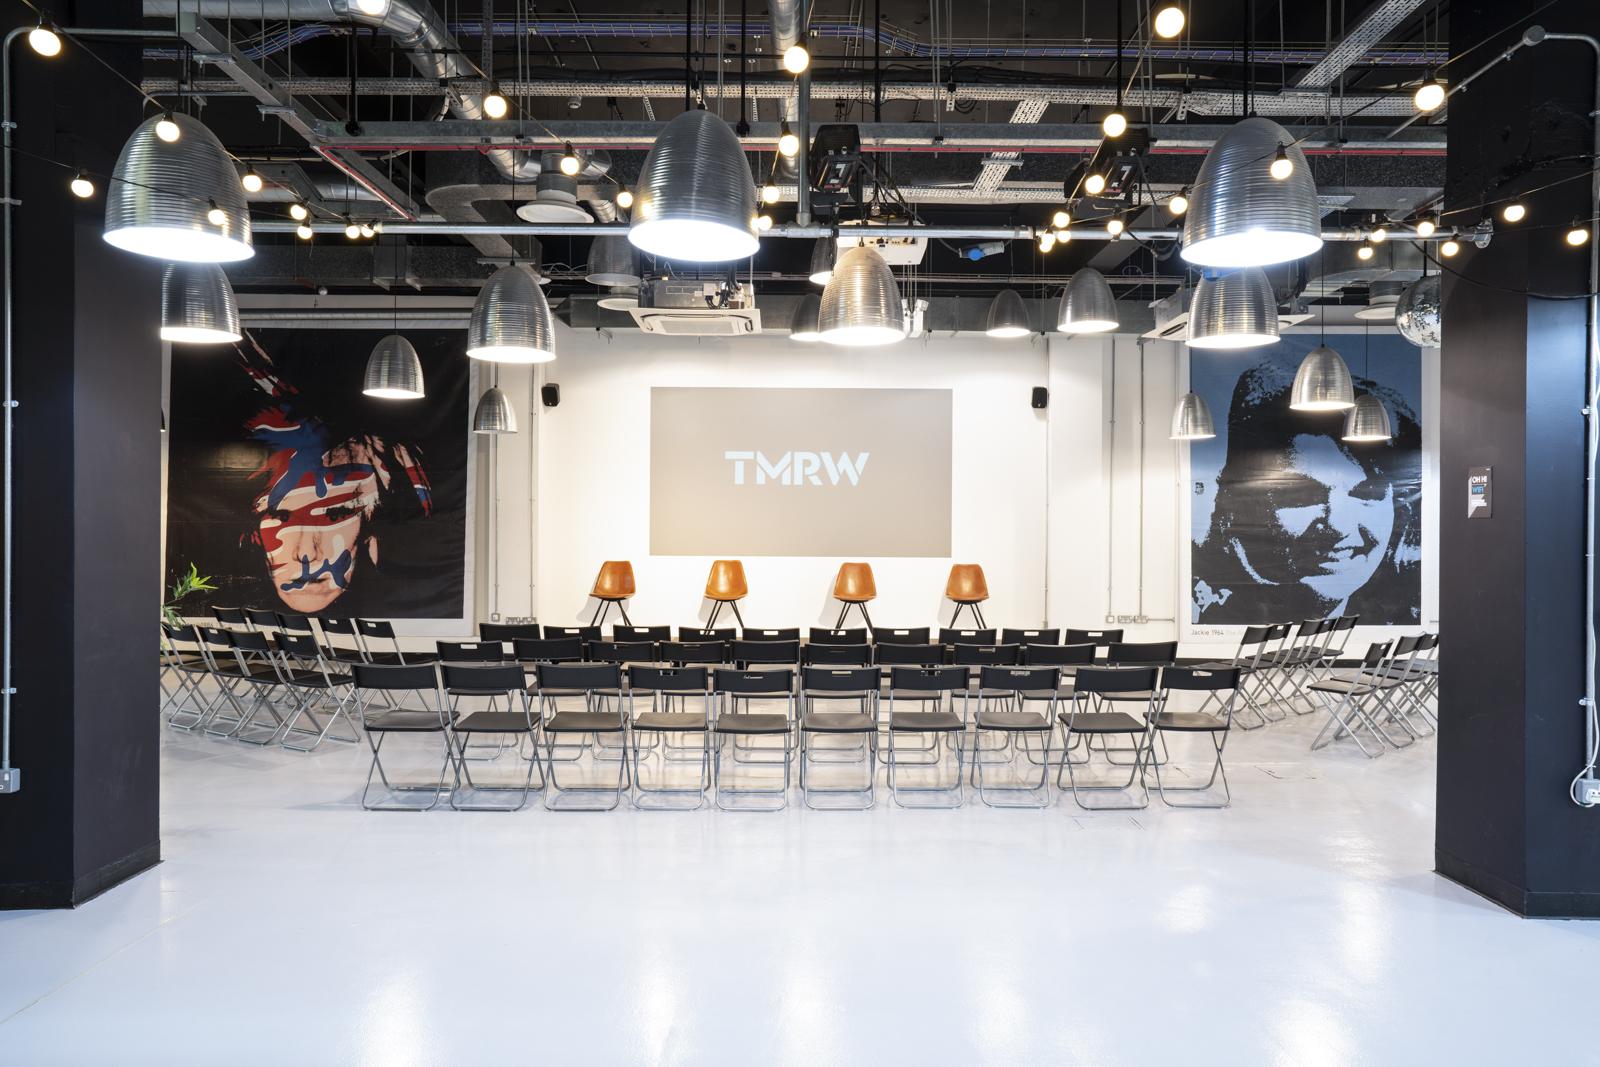 Stage at TMRW events space Croydon